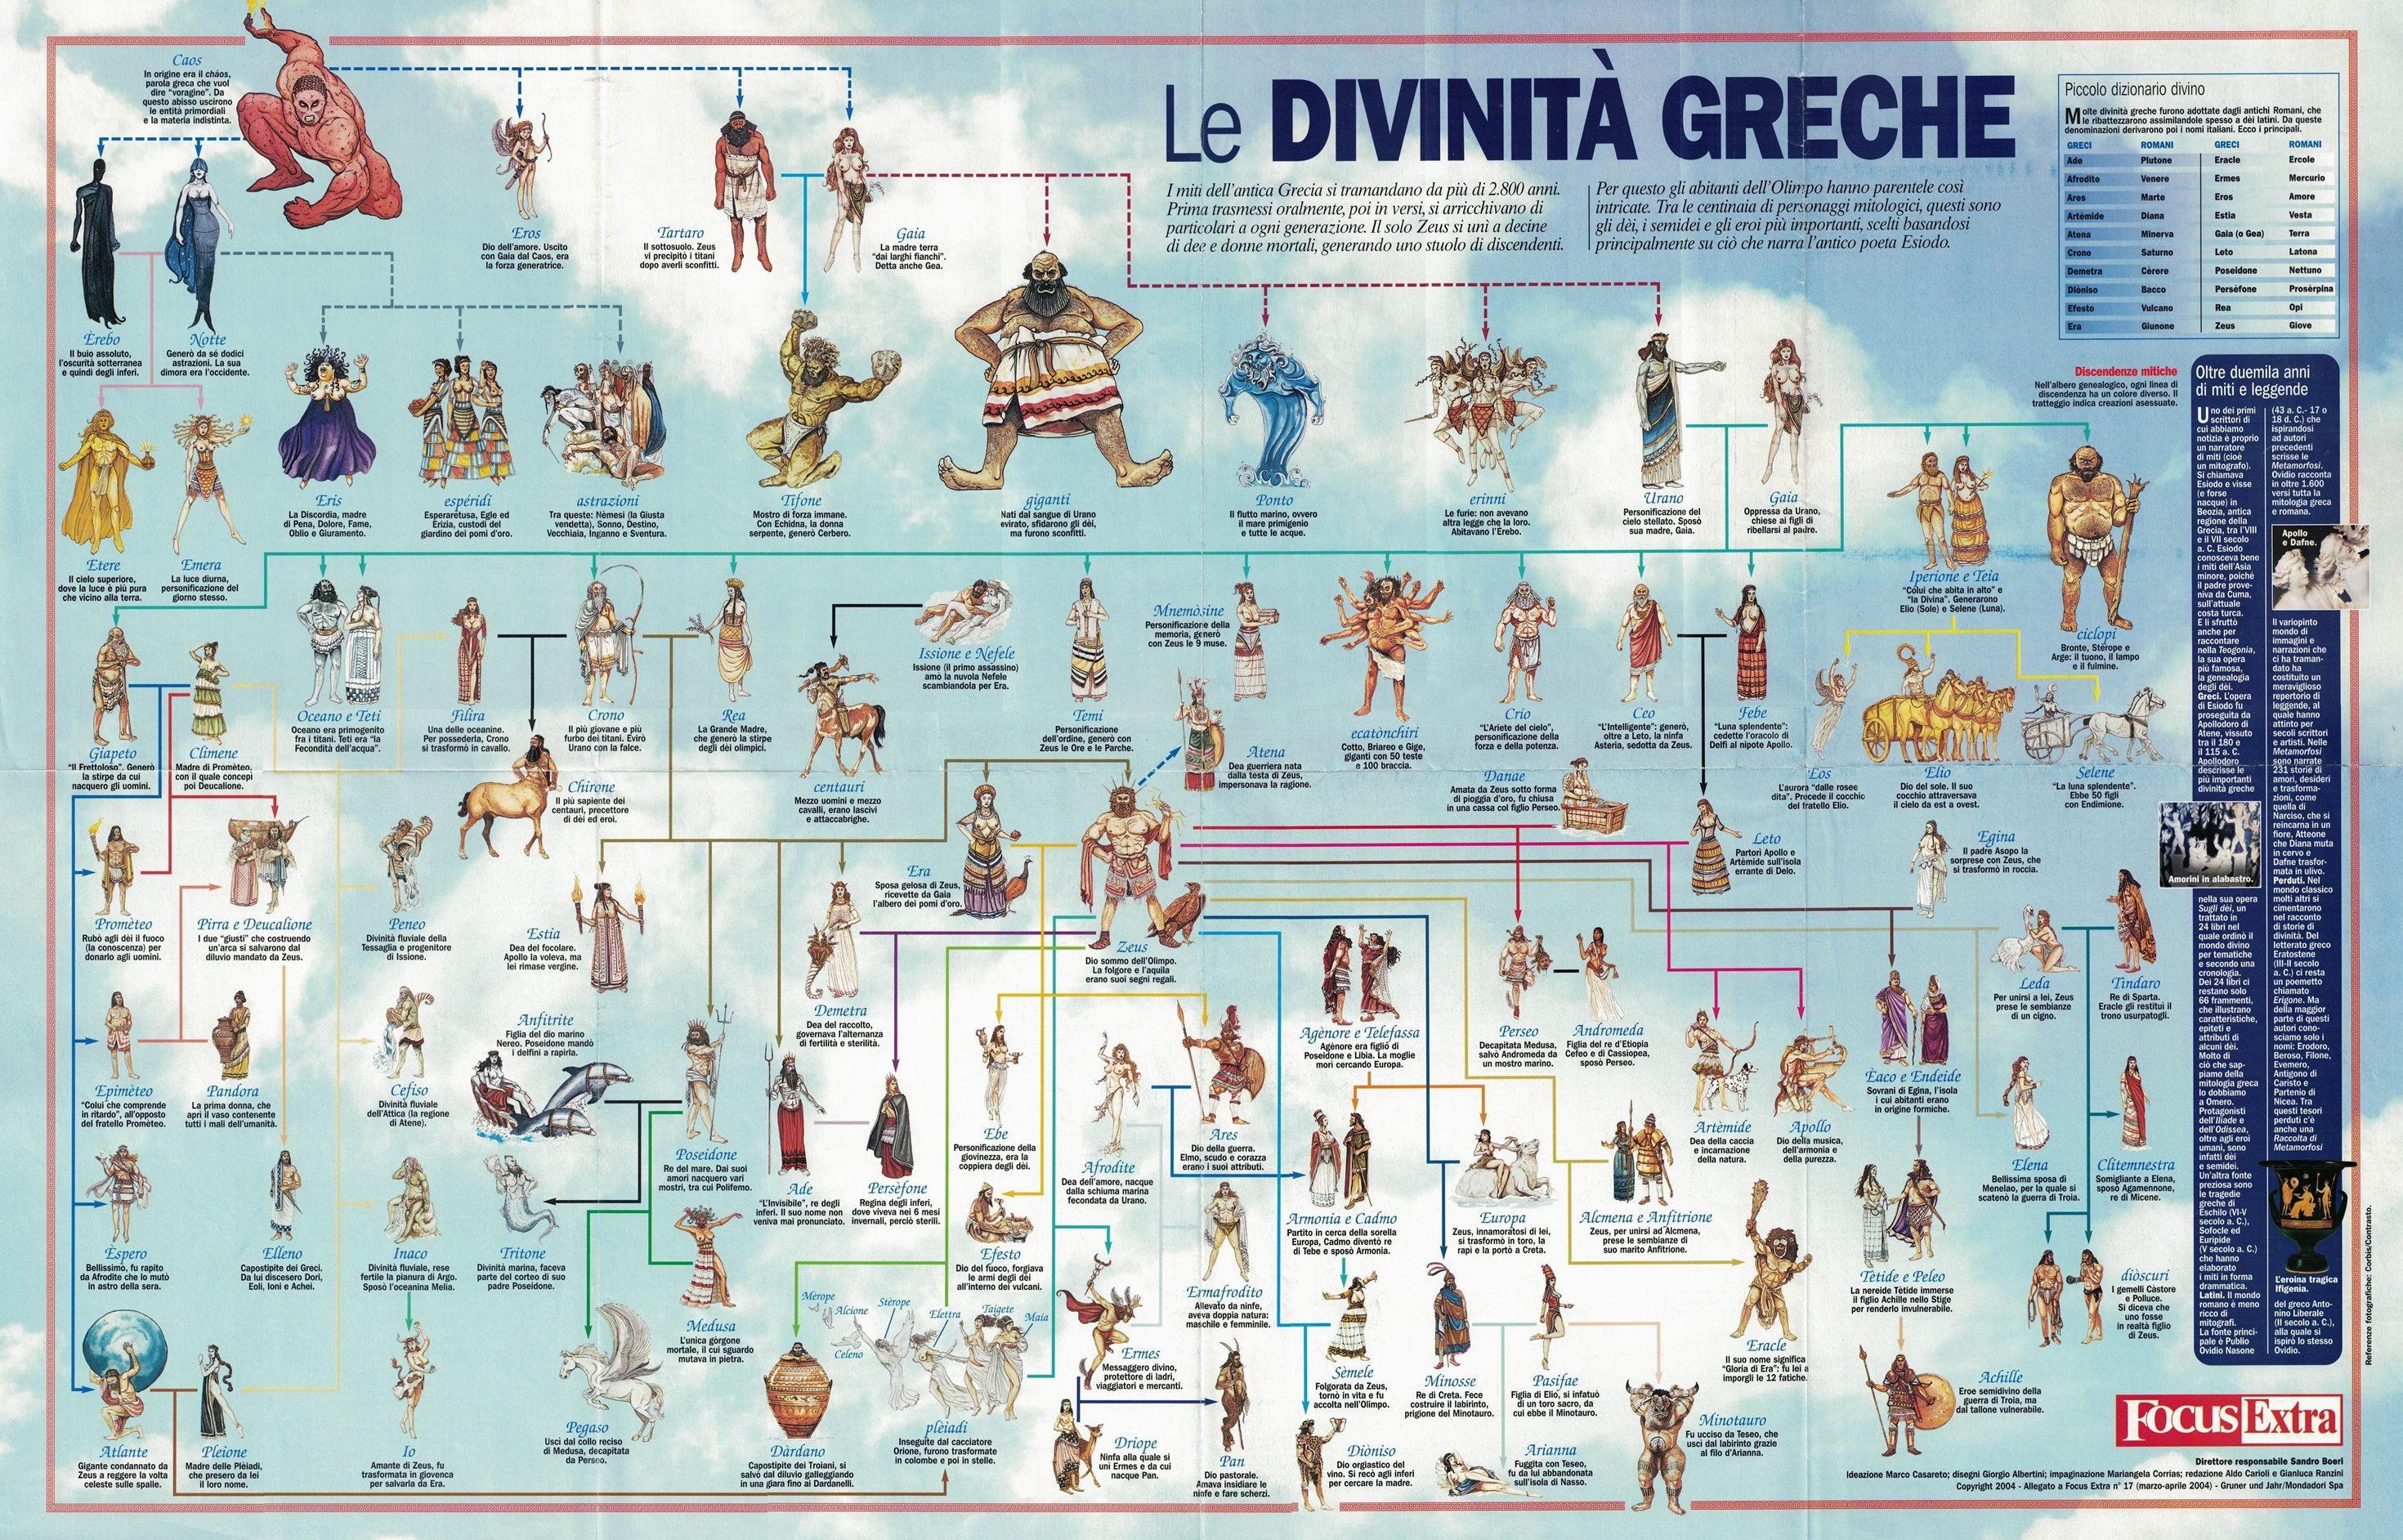 antiche orge greche gratis amatuer xxx pics